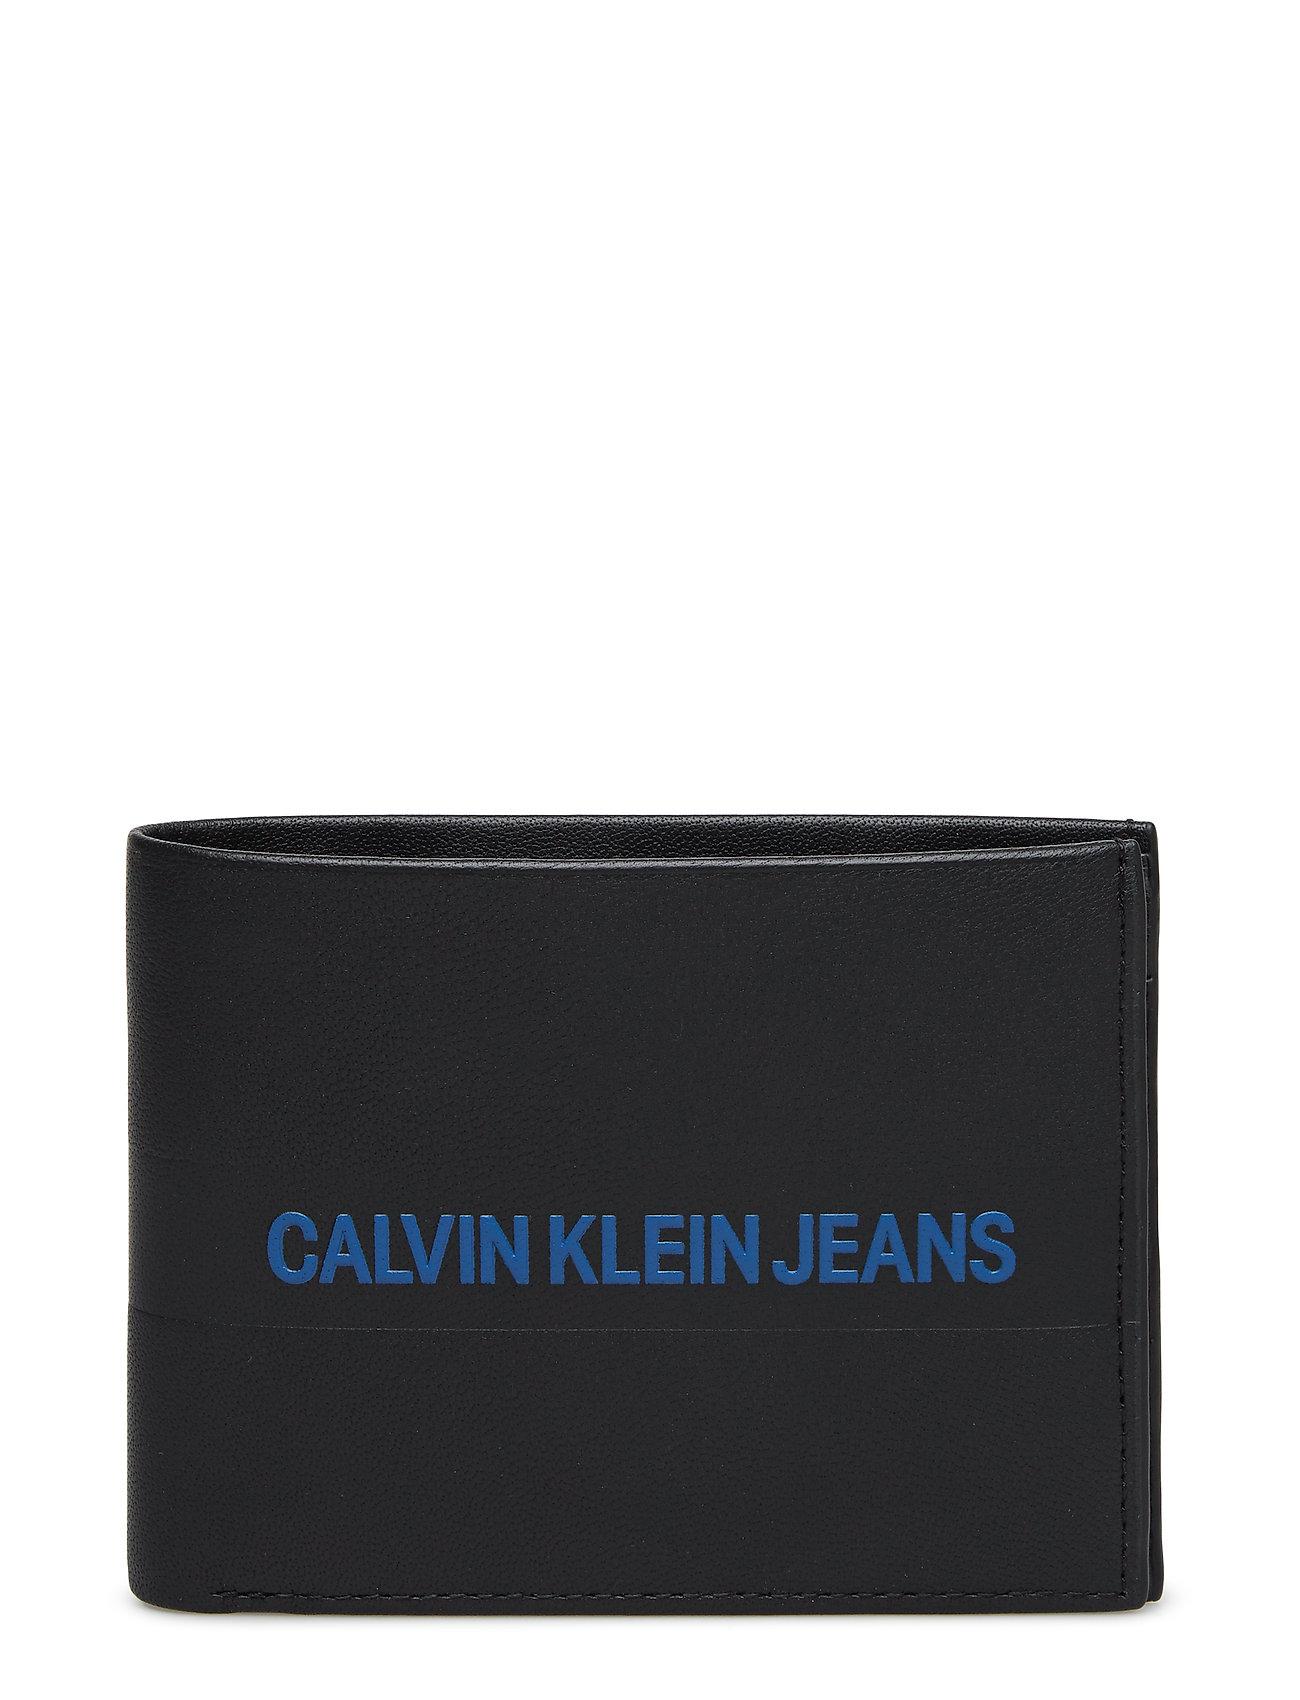 Calvin Klein LOGO STRIPE BILLFOLD - BLACK